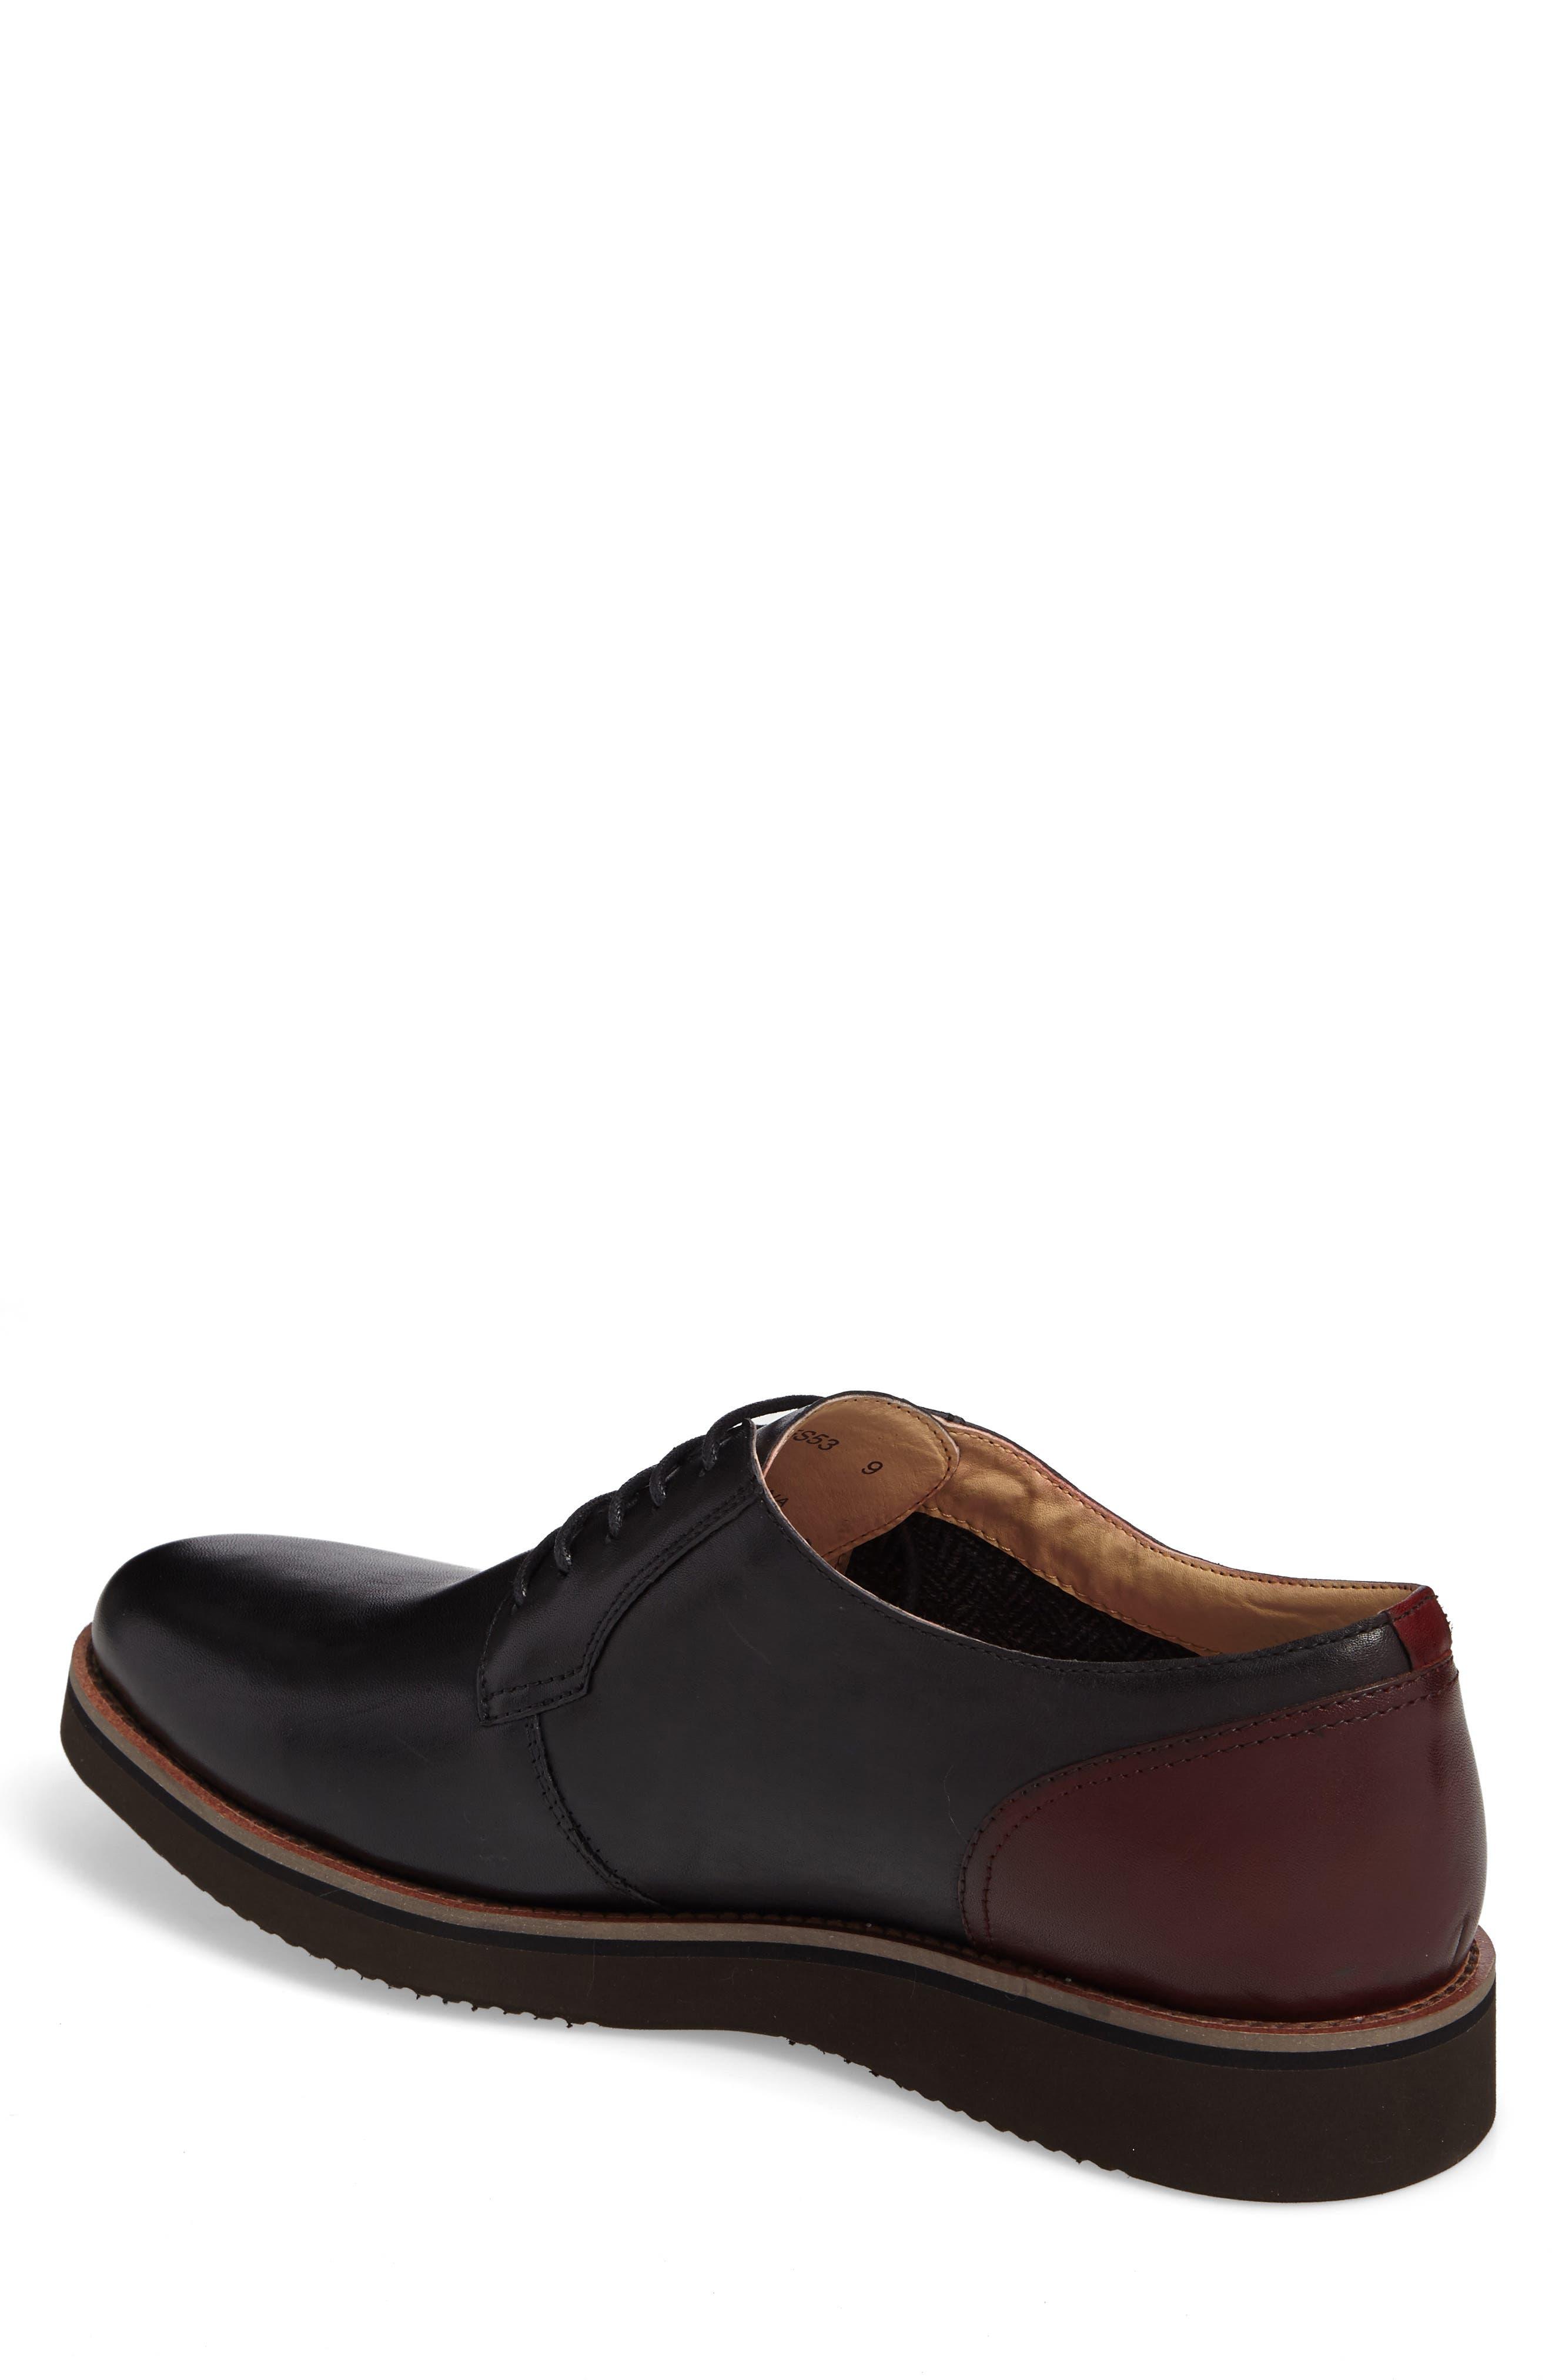 Saxon Plain Toe Derby,                             Alternate thumbnail 2, color,                             Black Leather